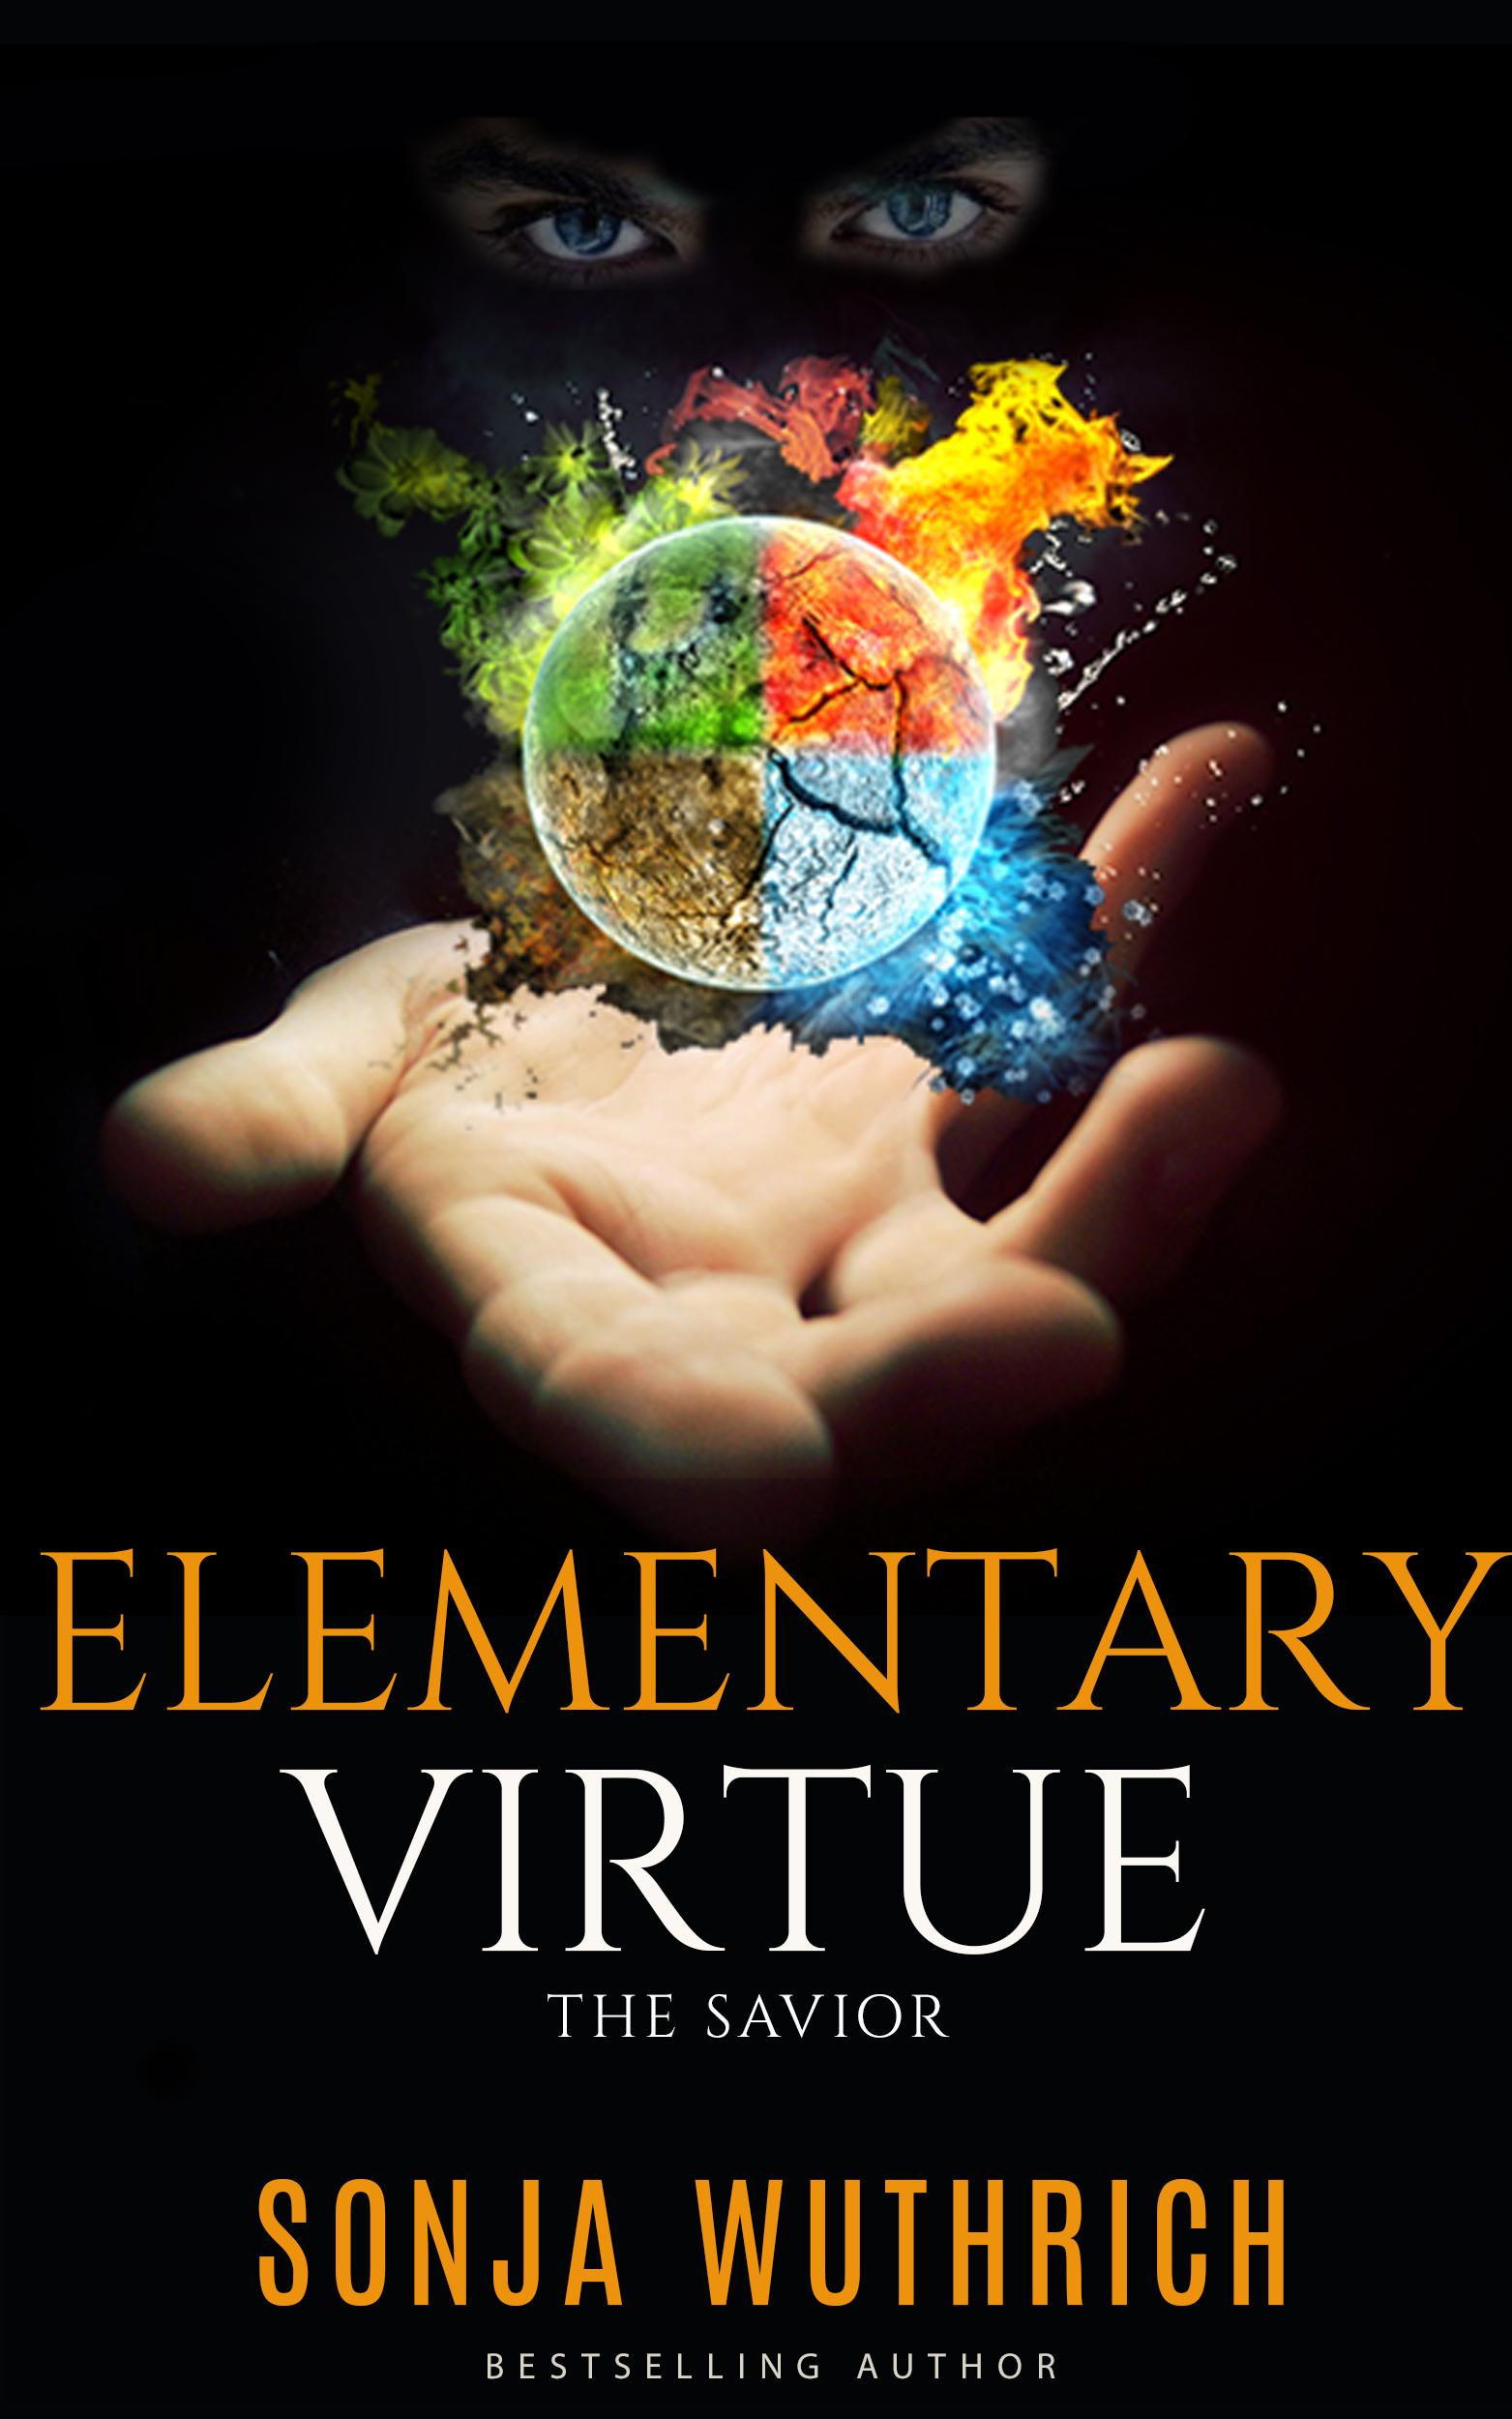 Elementary_Virtue